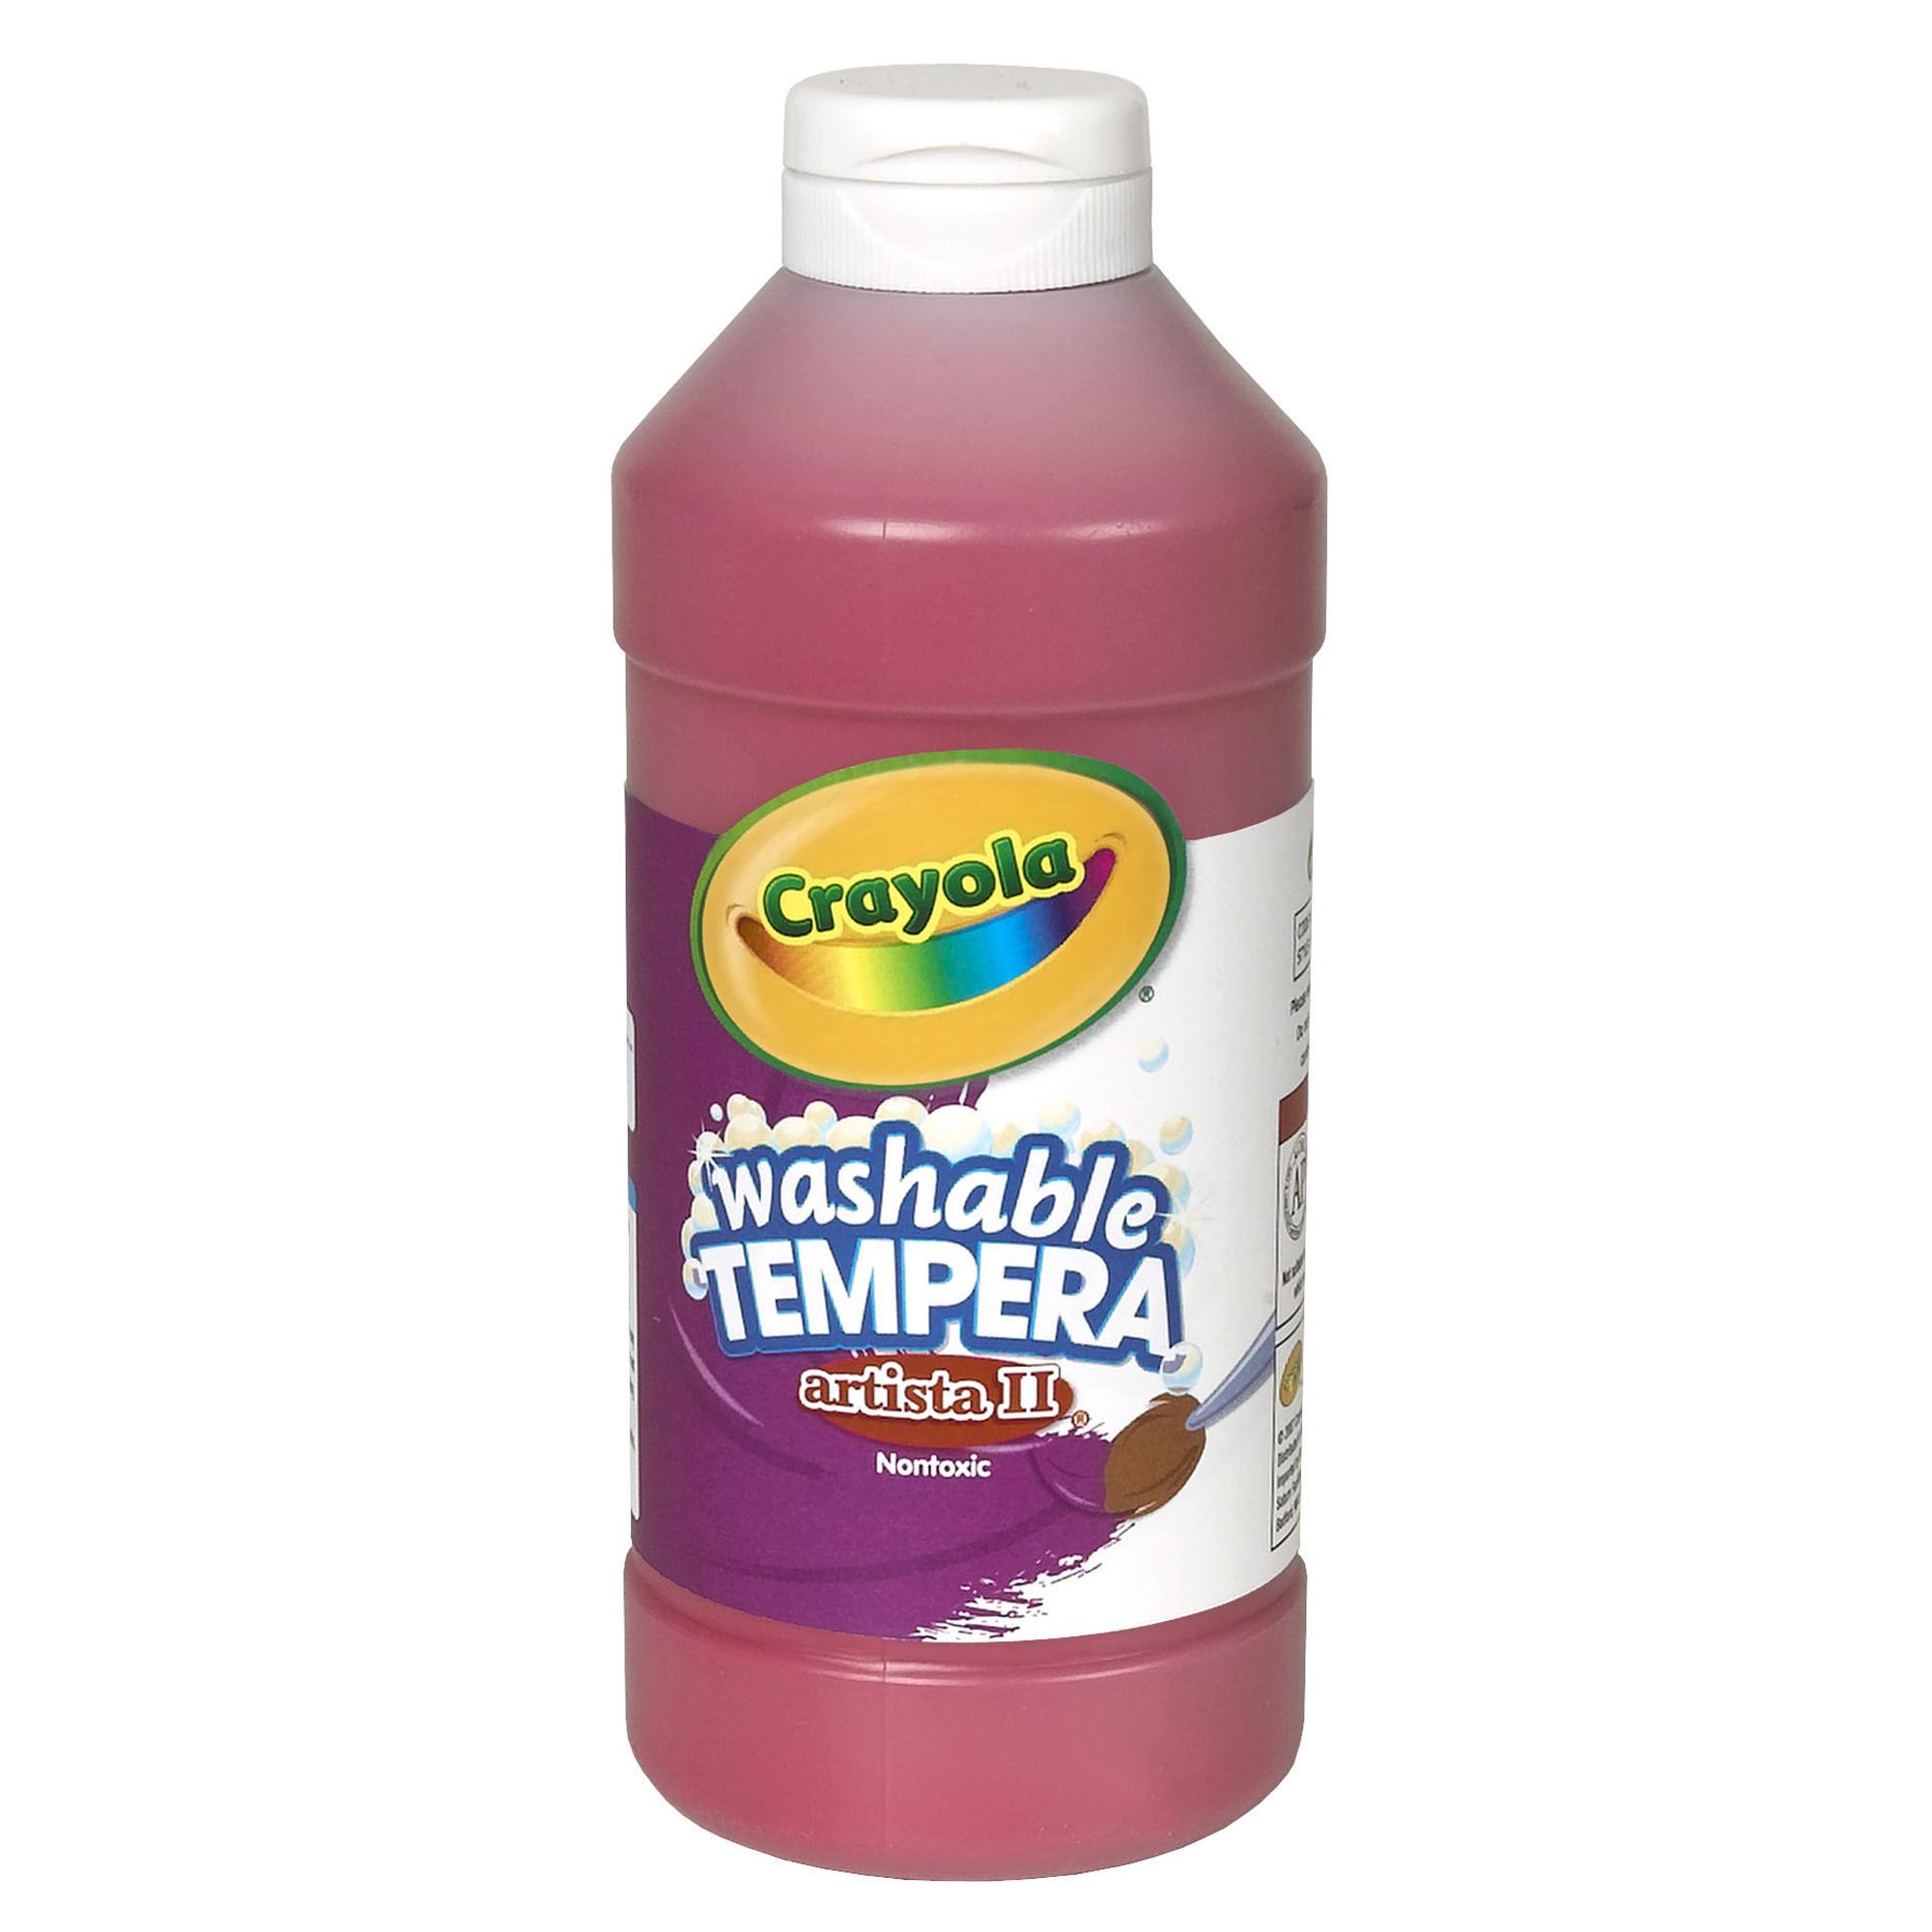 Crayola Artista Ii Washable Liquid Tempera Paint, Red, 16 Oz Bottle, Set Of 6 Bottles